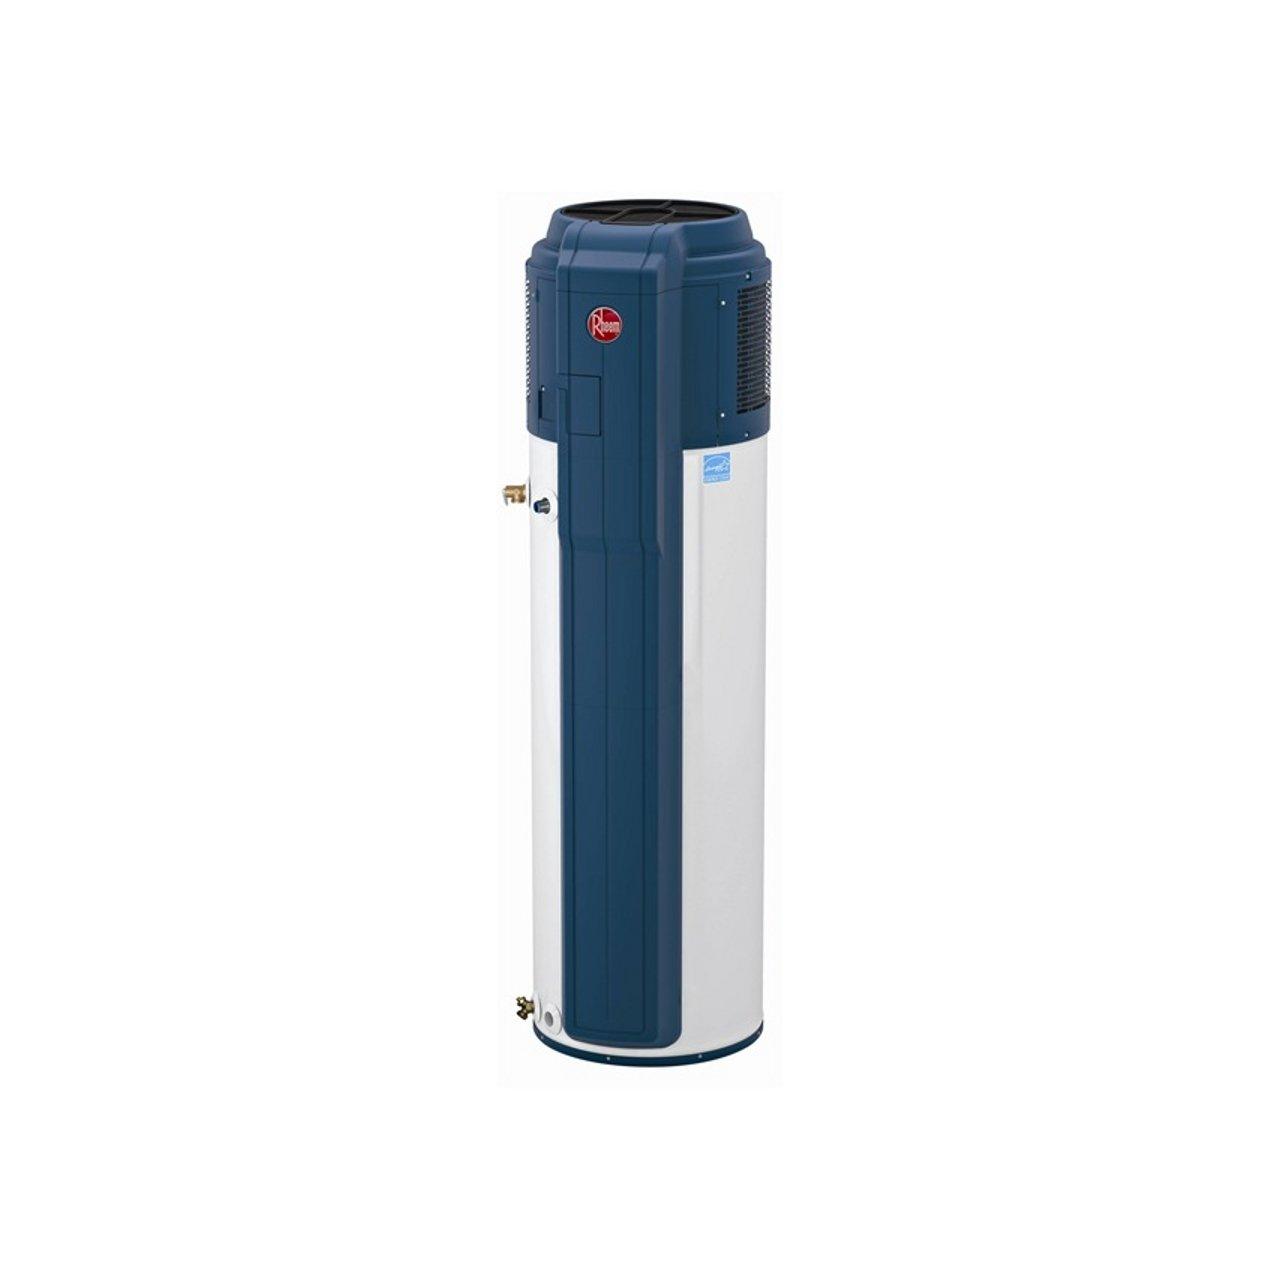 rheem 50 gallon hot water heater. rheem hp50rh heat pump water heater, 50-gallon, heaters - amazon canada 50 gallon hot heater b